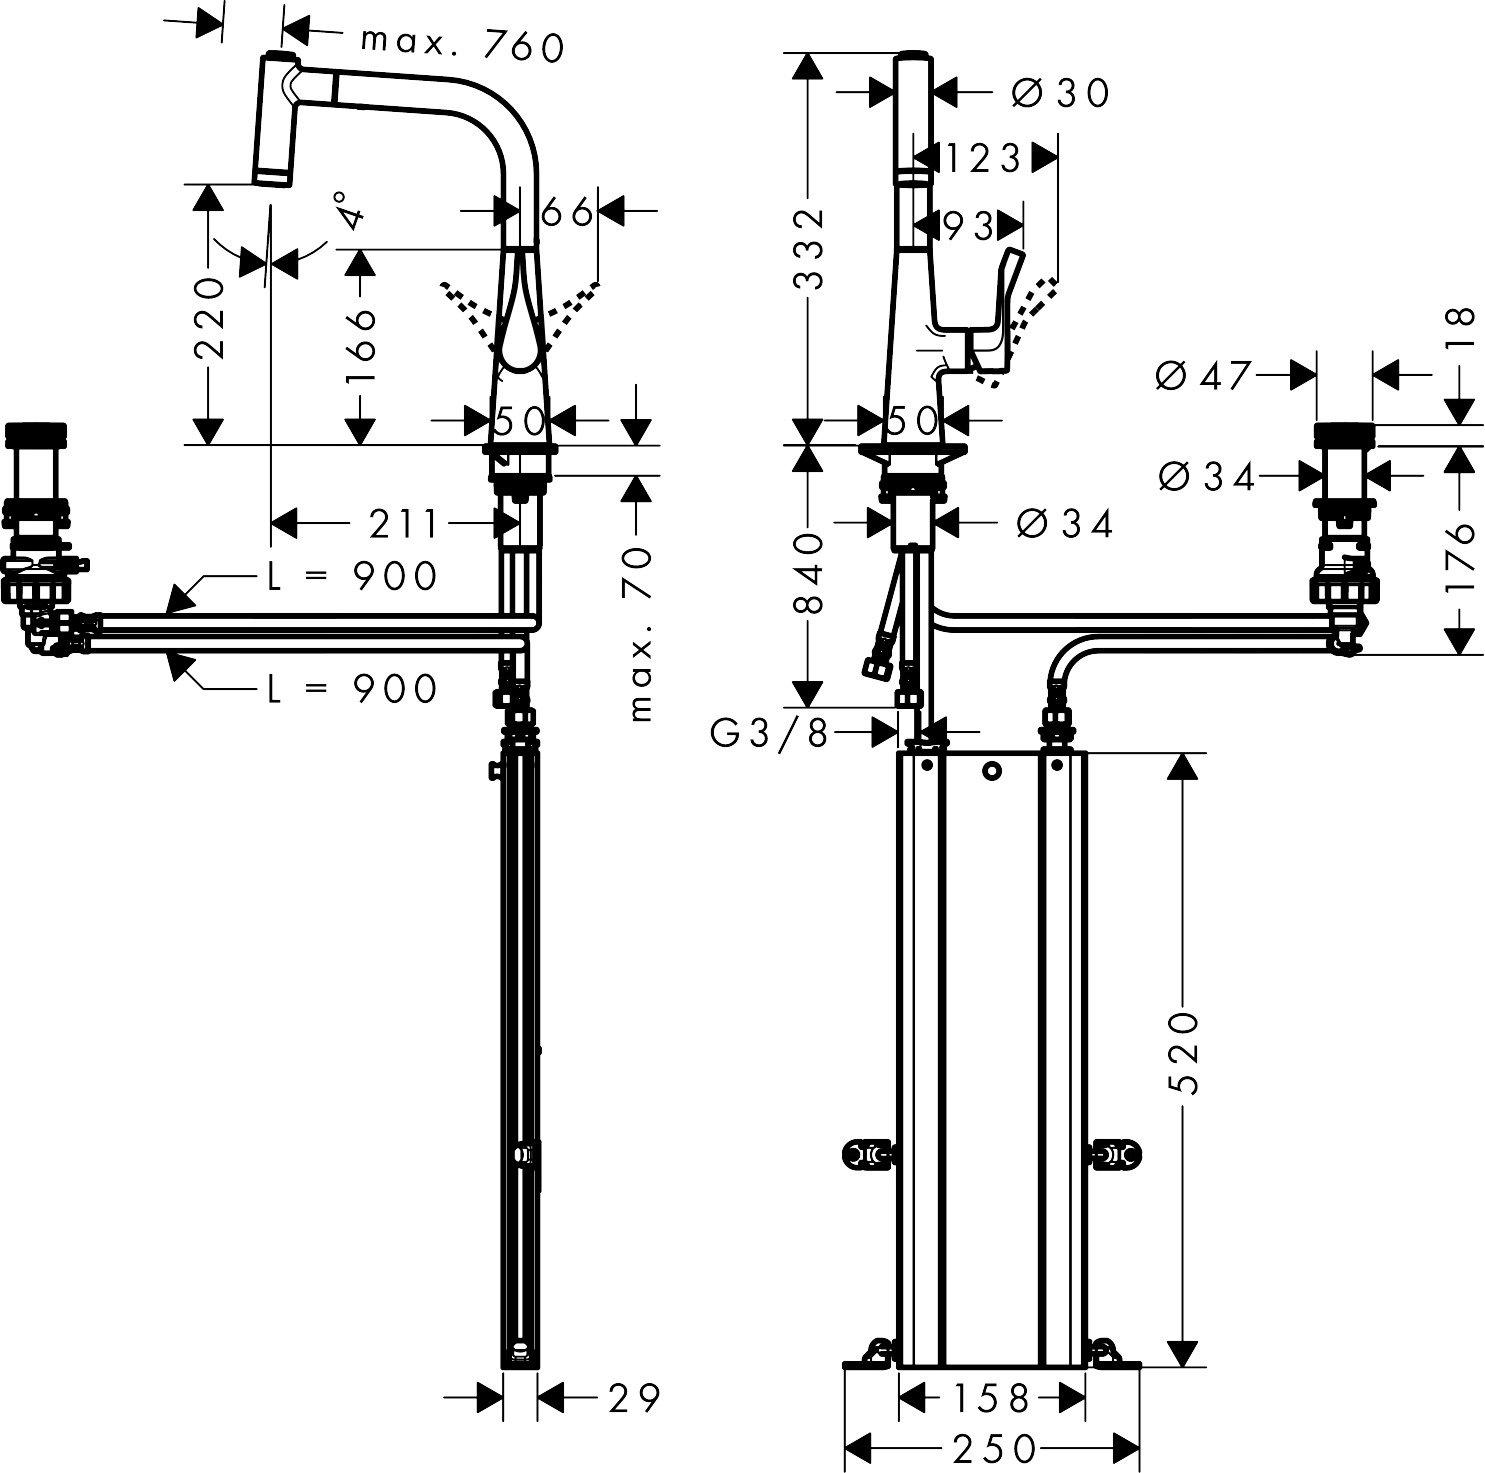 Jelenko Furnace Manual Ebook Komatsu D20 Wiring Diagram Array 98 Suzuki Rm 250 Rh Zettadata